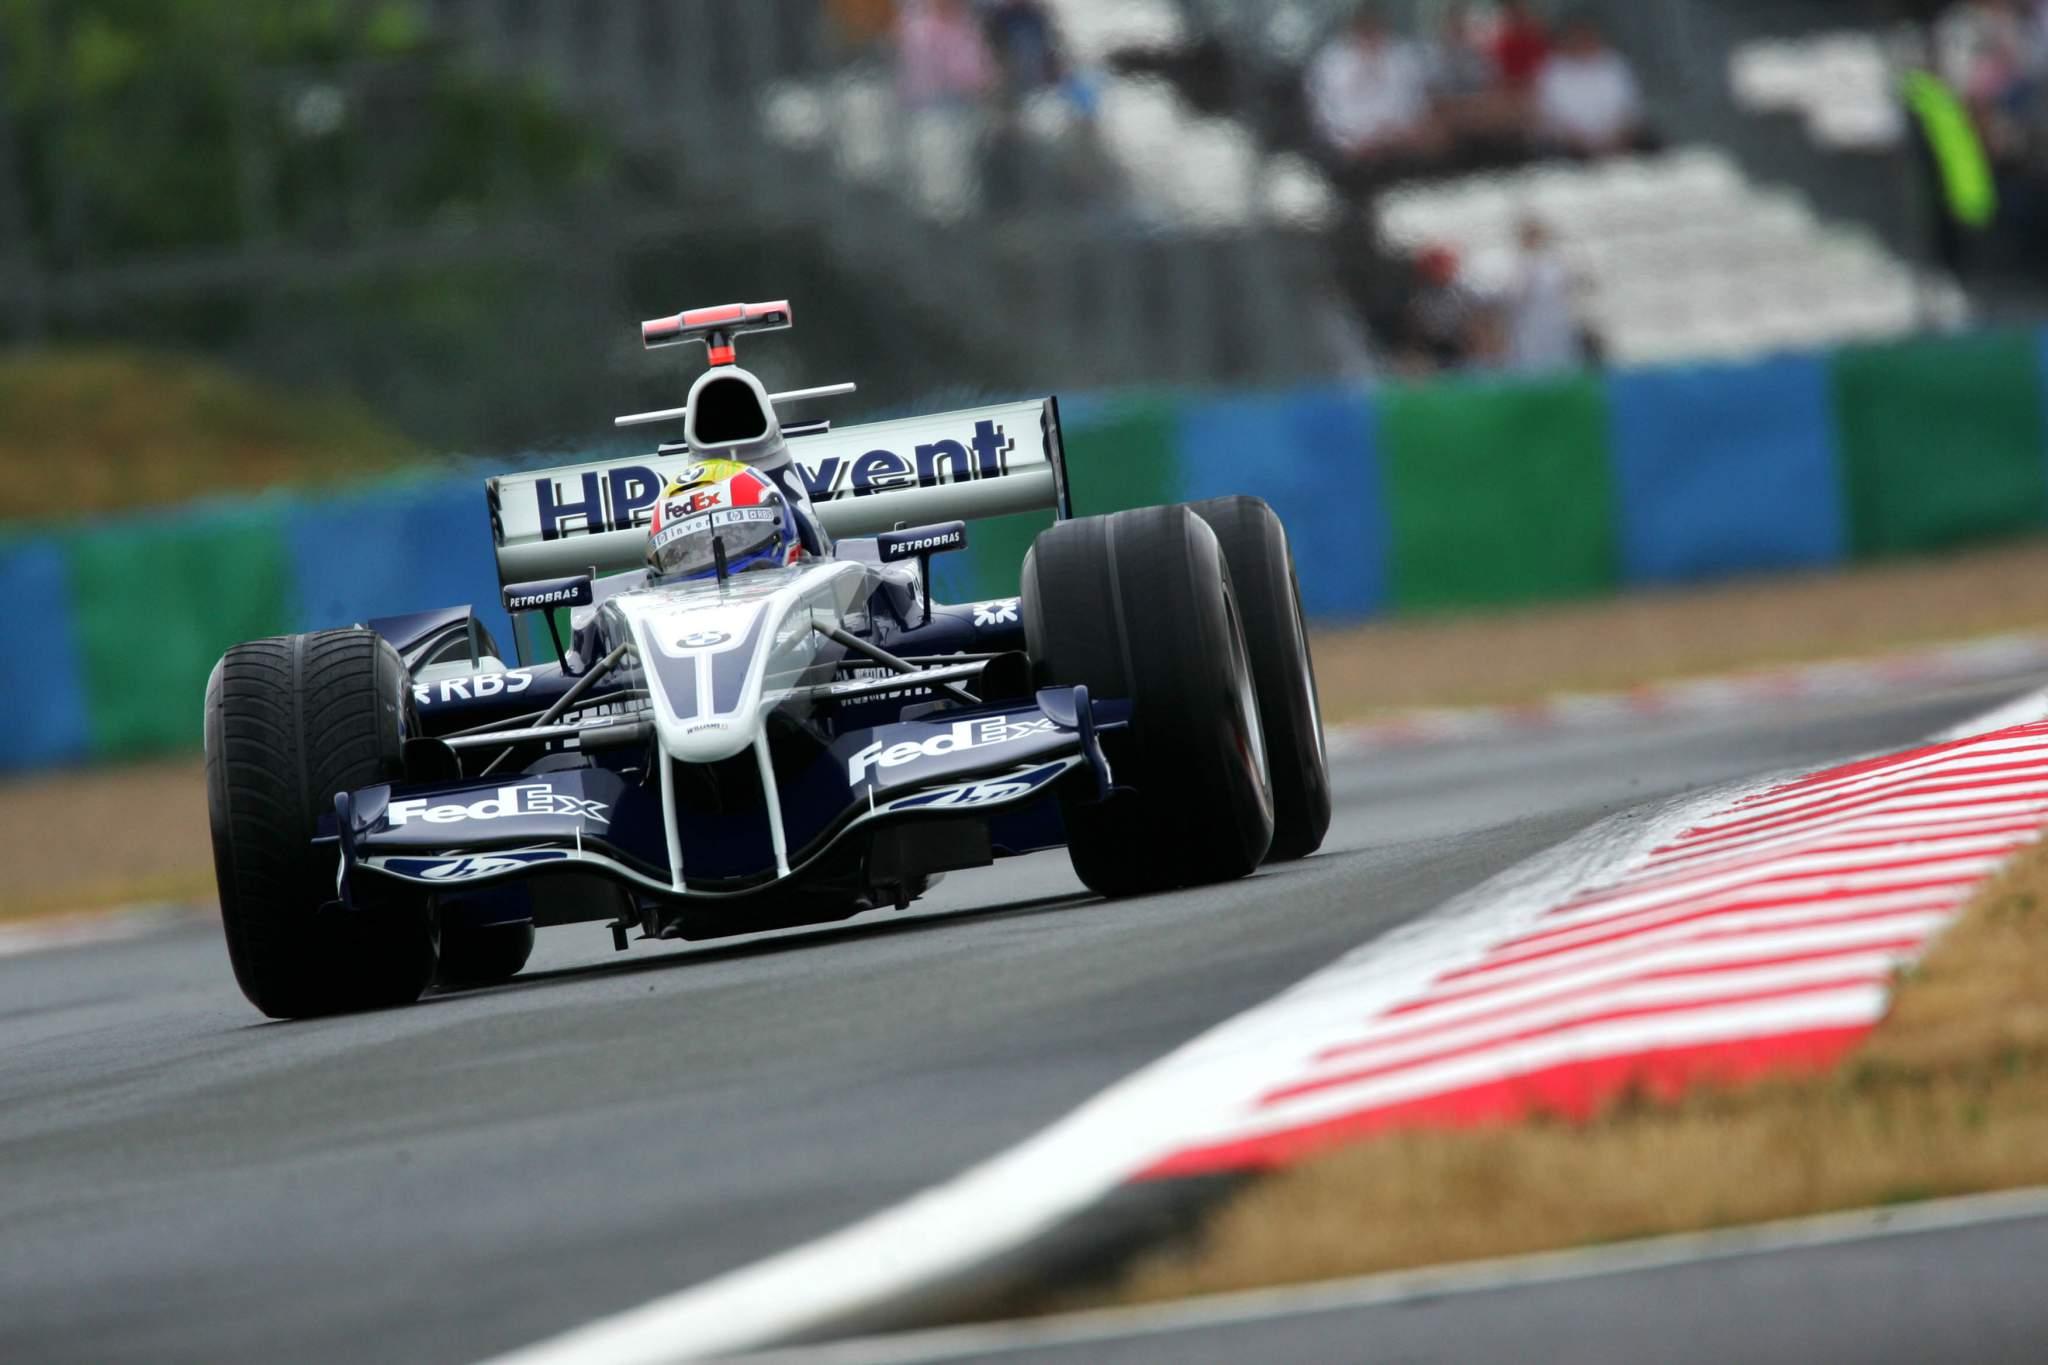 BMW Williams F1 2005